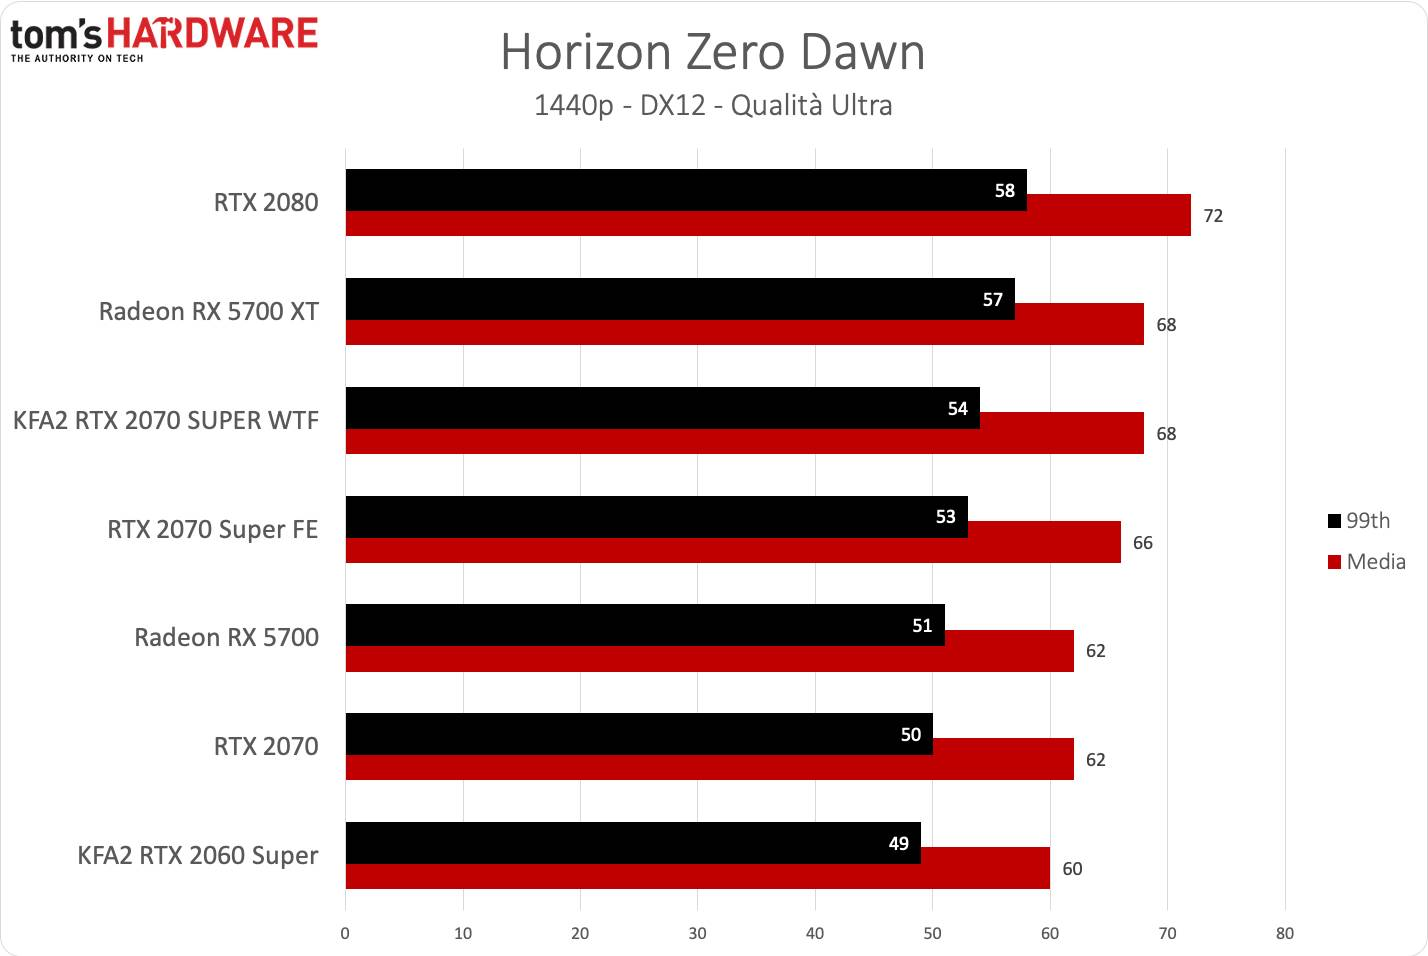 KFA2 RTX 2070 SUPER WTF - Horizon QHD